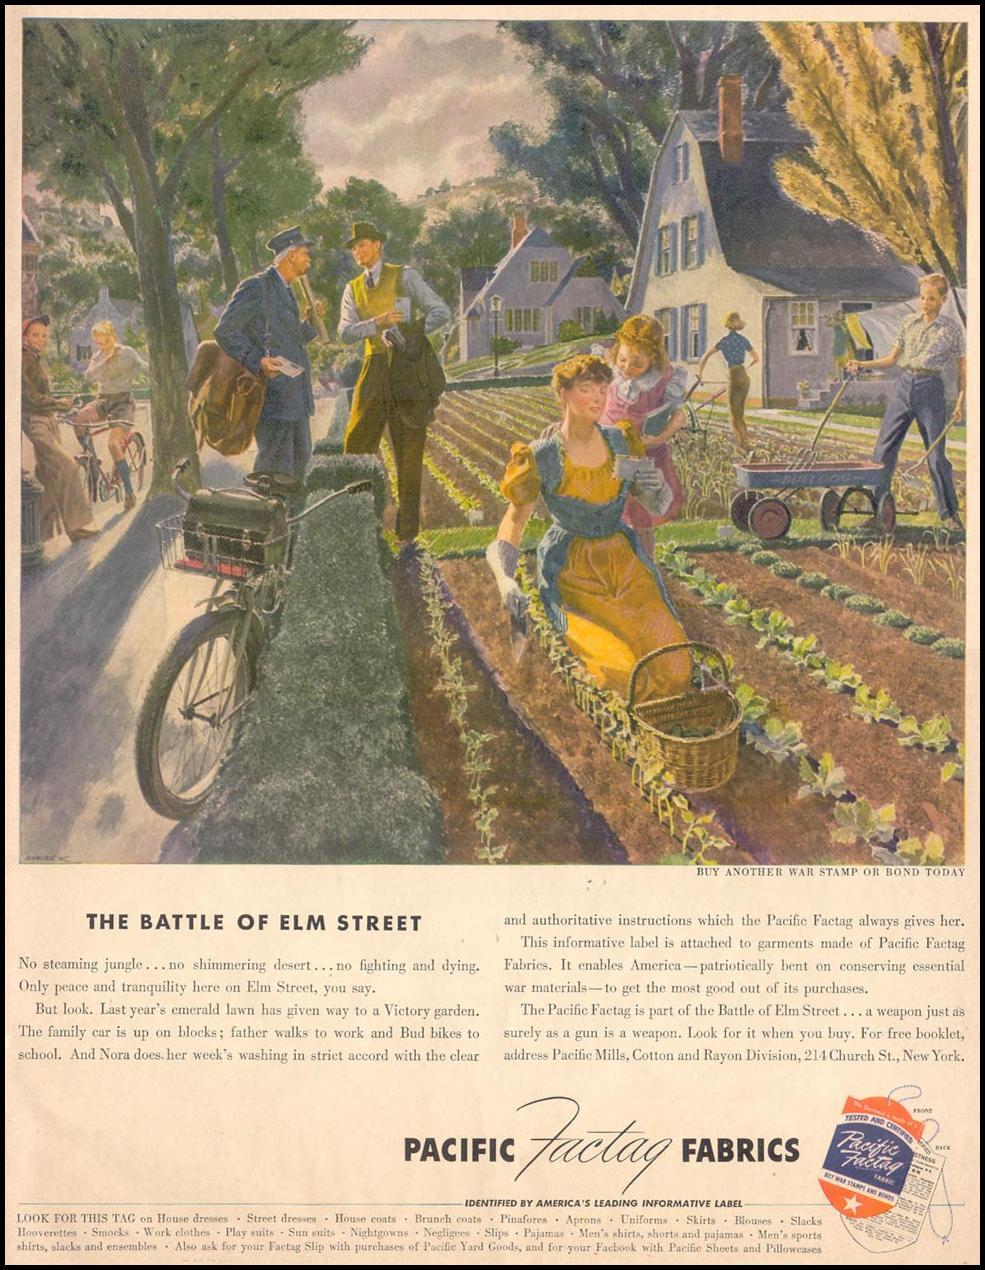 PACIFIC FACTAG FABRICS LIFE 05/24/1943